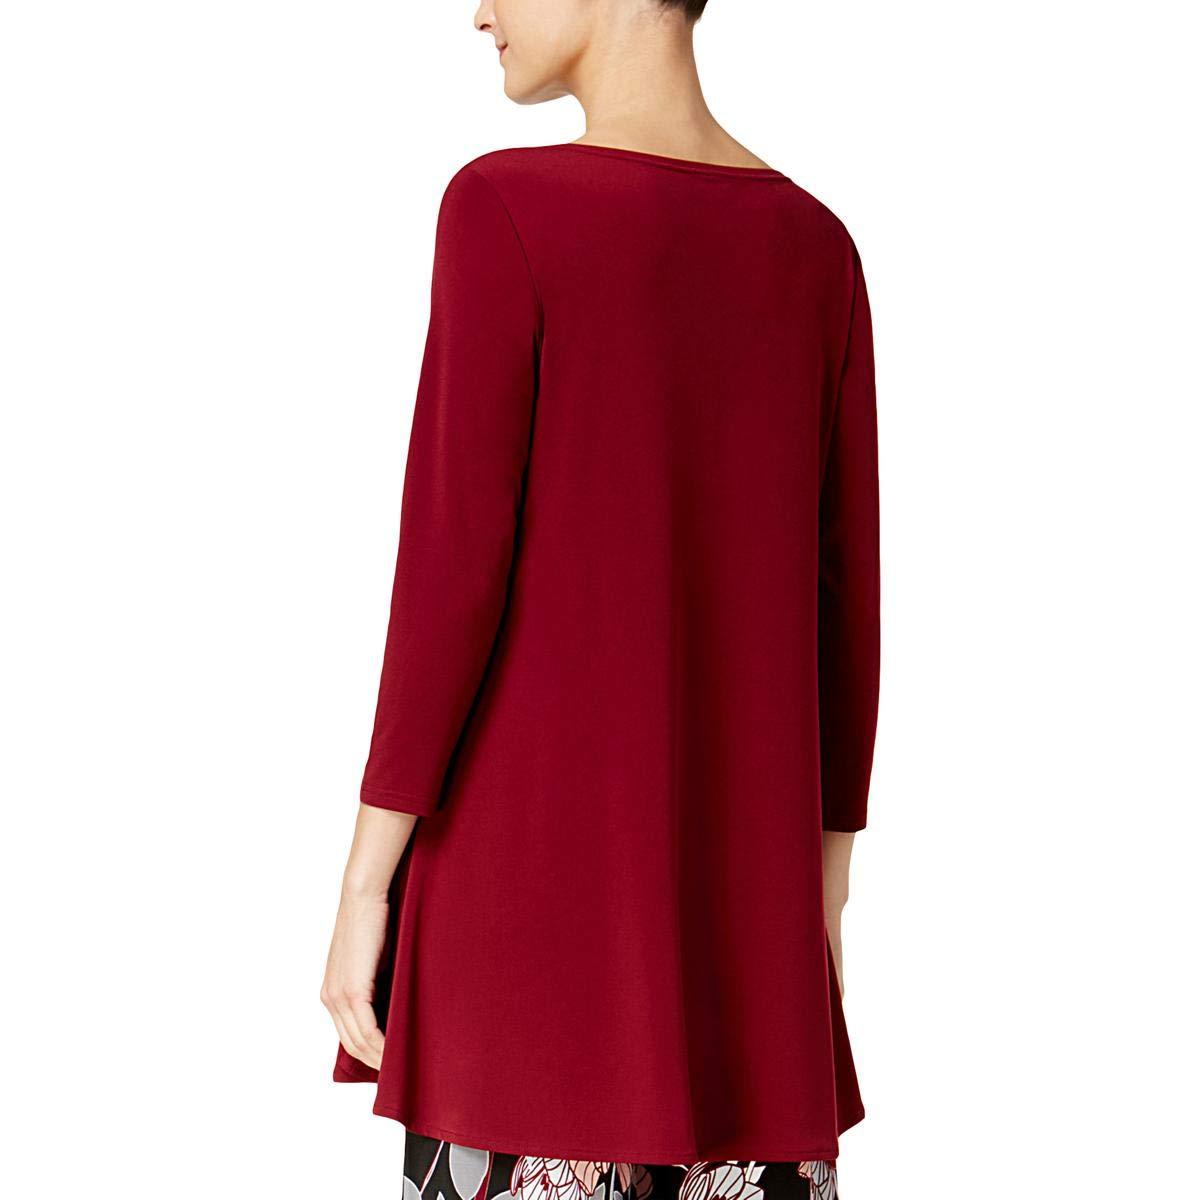 e273fa761e8 Alfani Womens Matte Jersey 3/4 Sleeves Blouse at Amazon Women's Clothing  store: